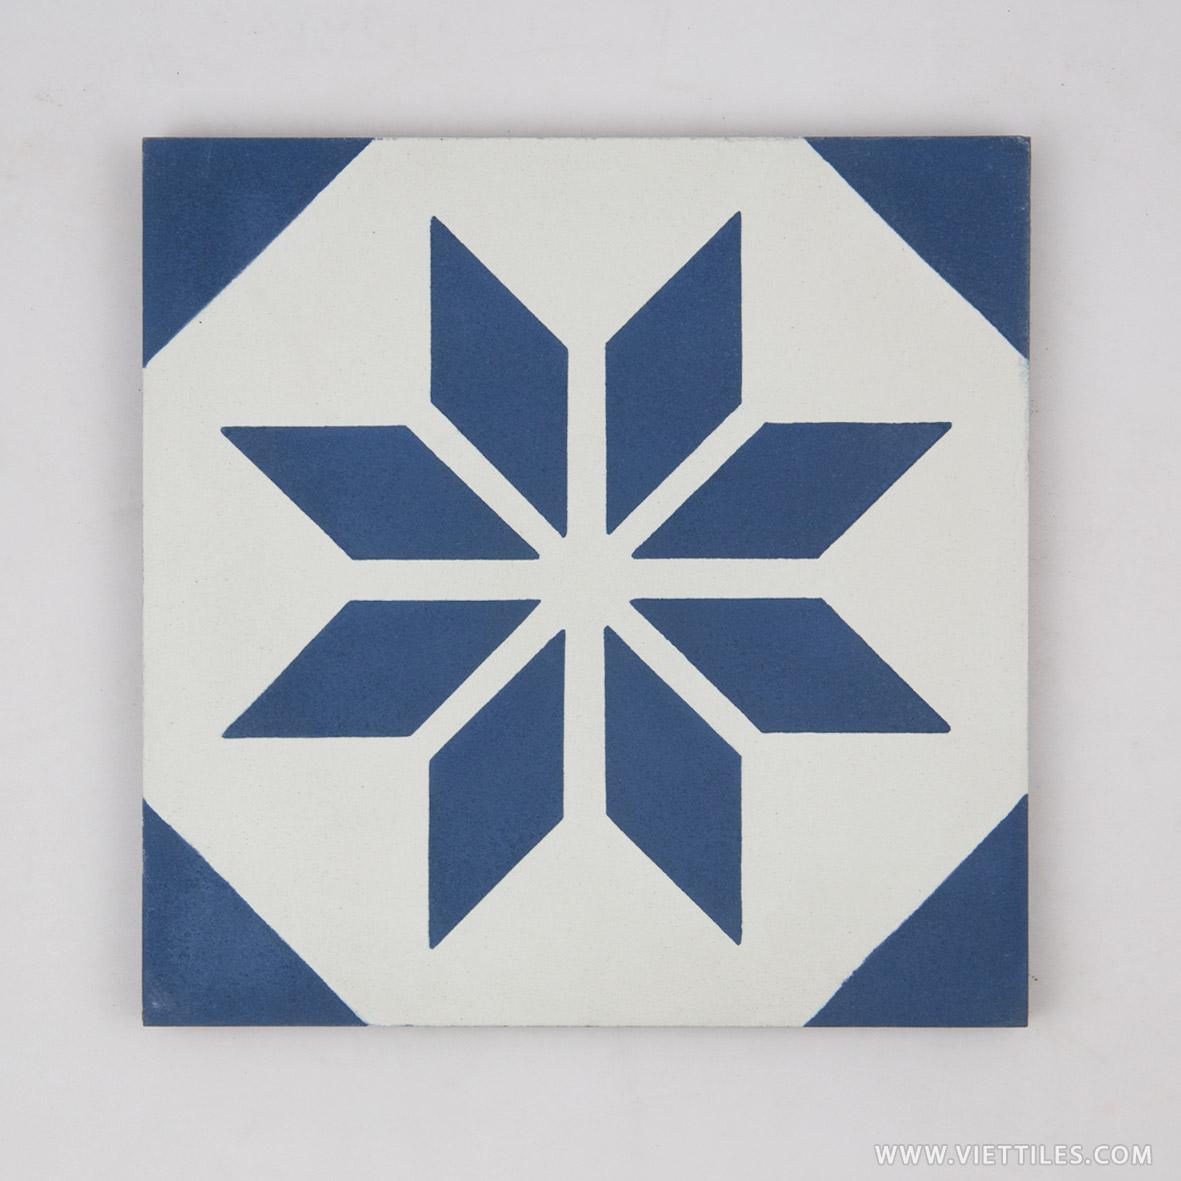 V20-002-T-02 Cement tile